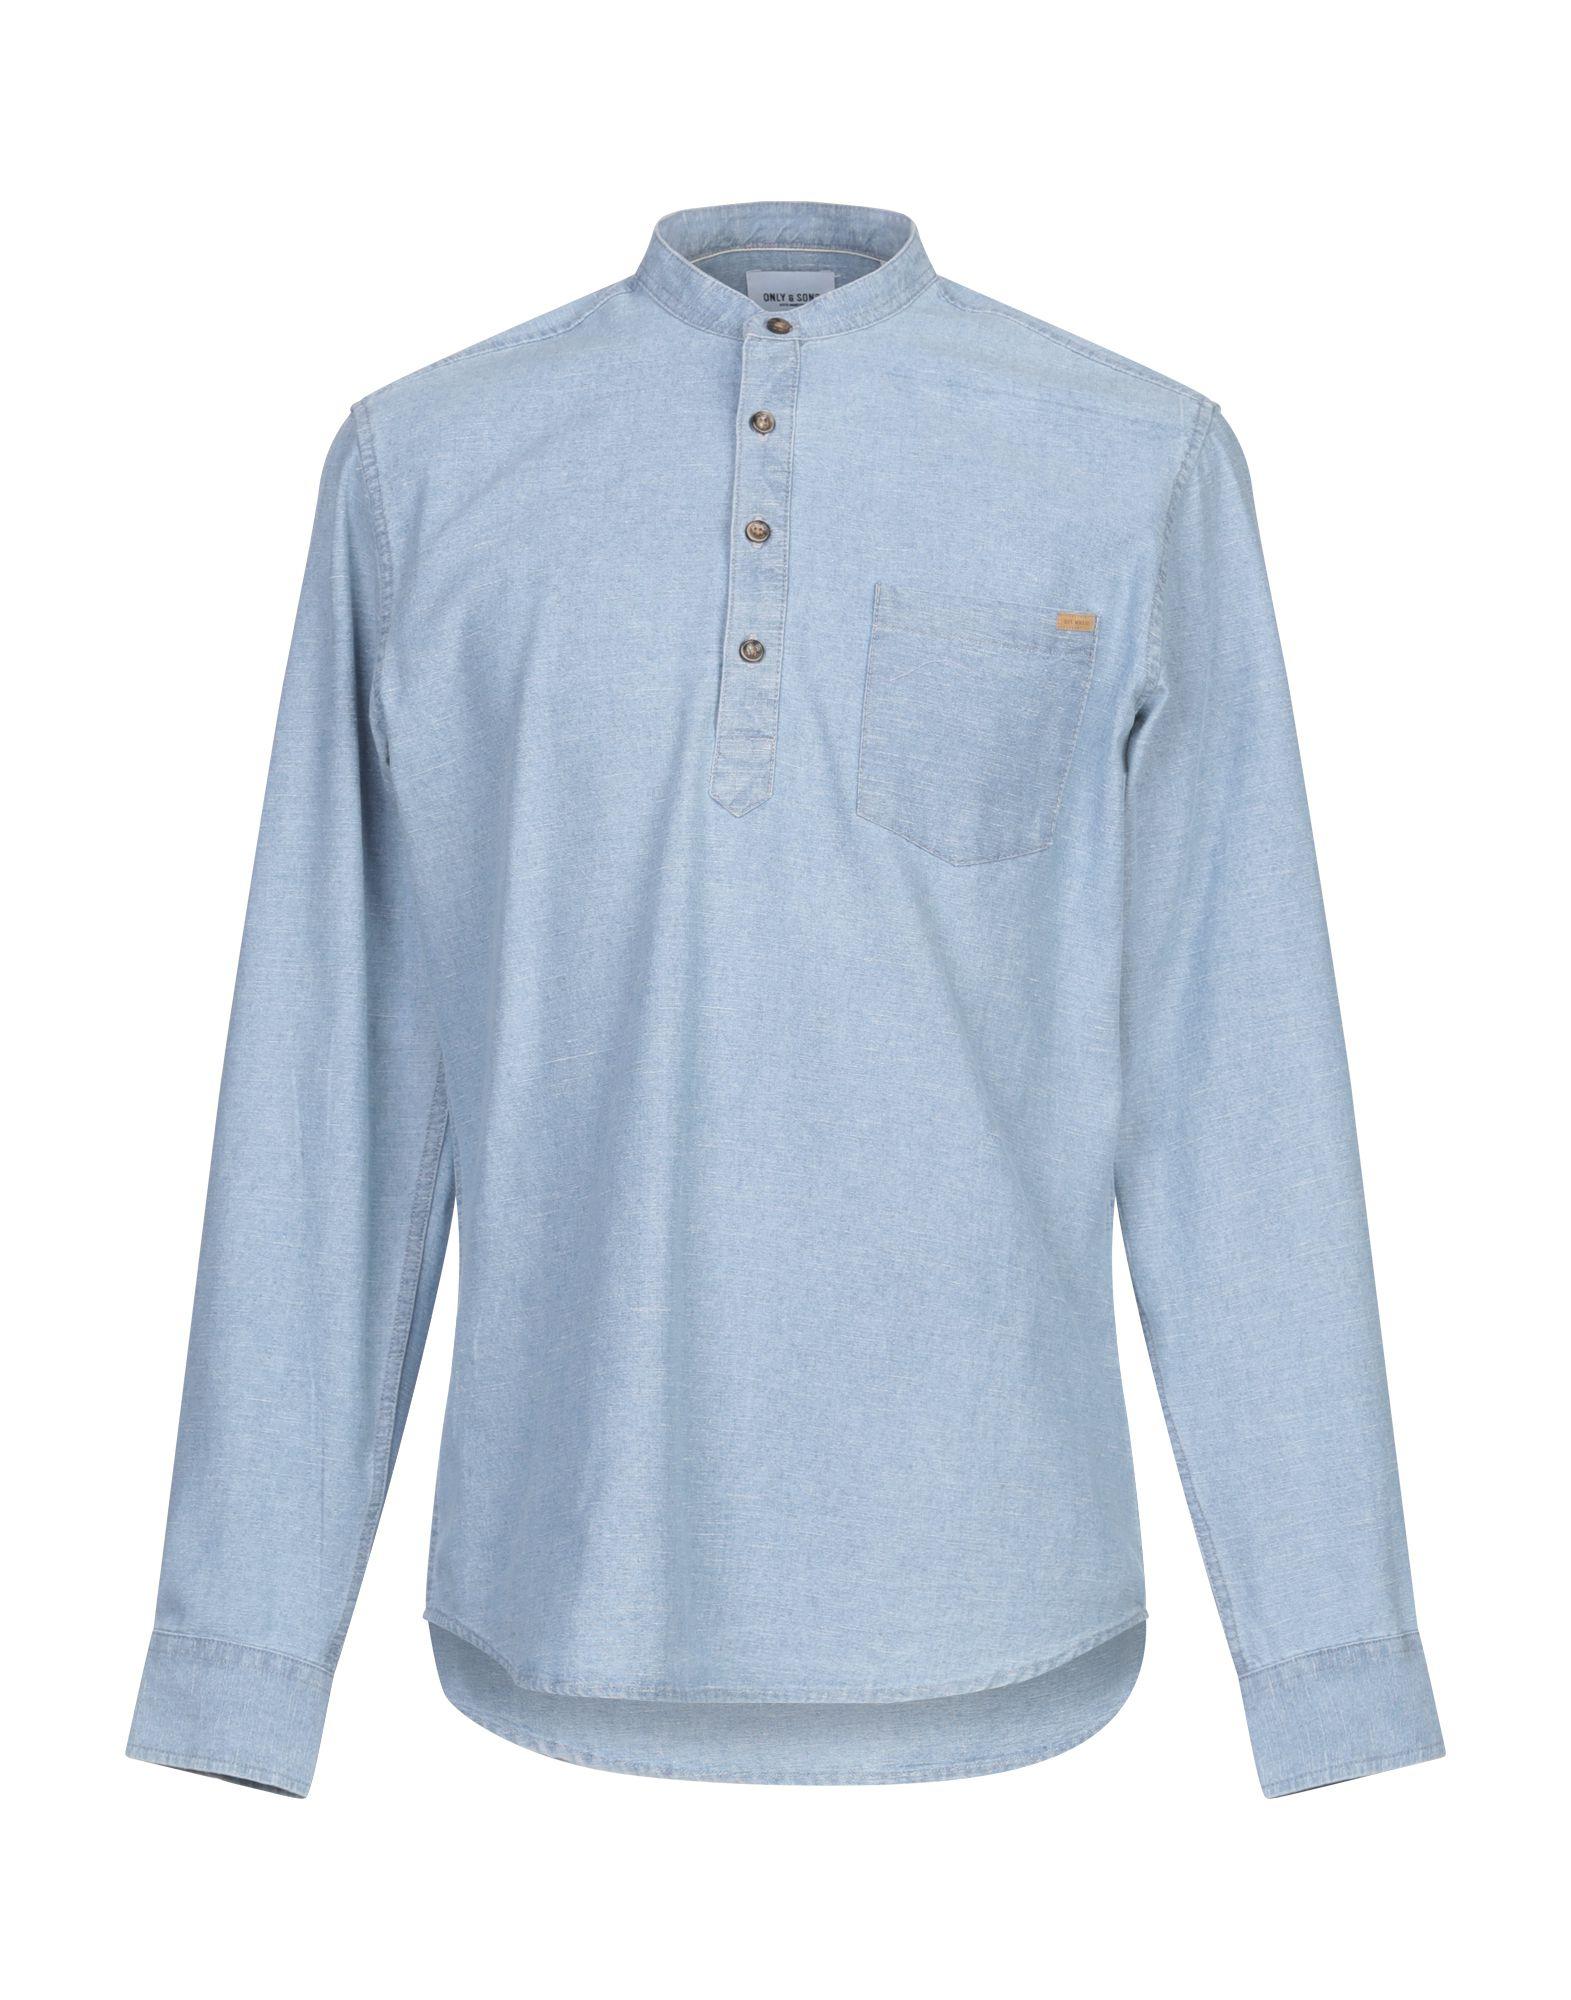 ONLY & SONS Джинсовая рубашка